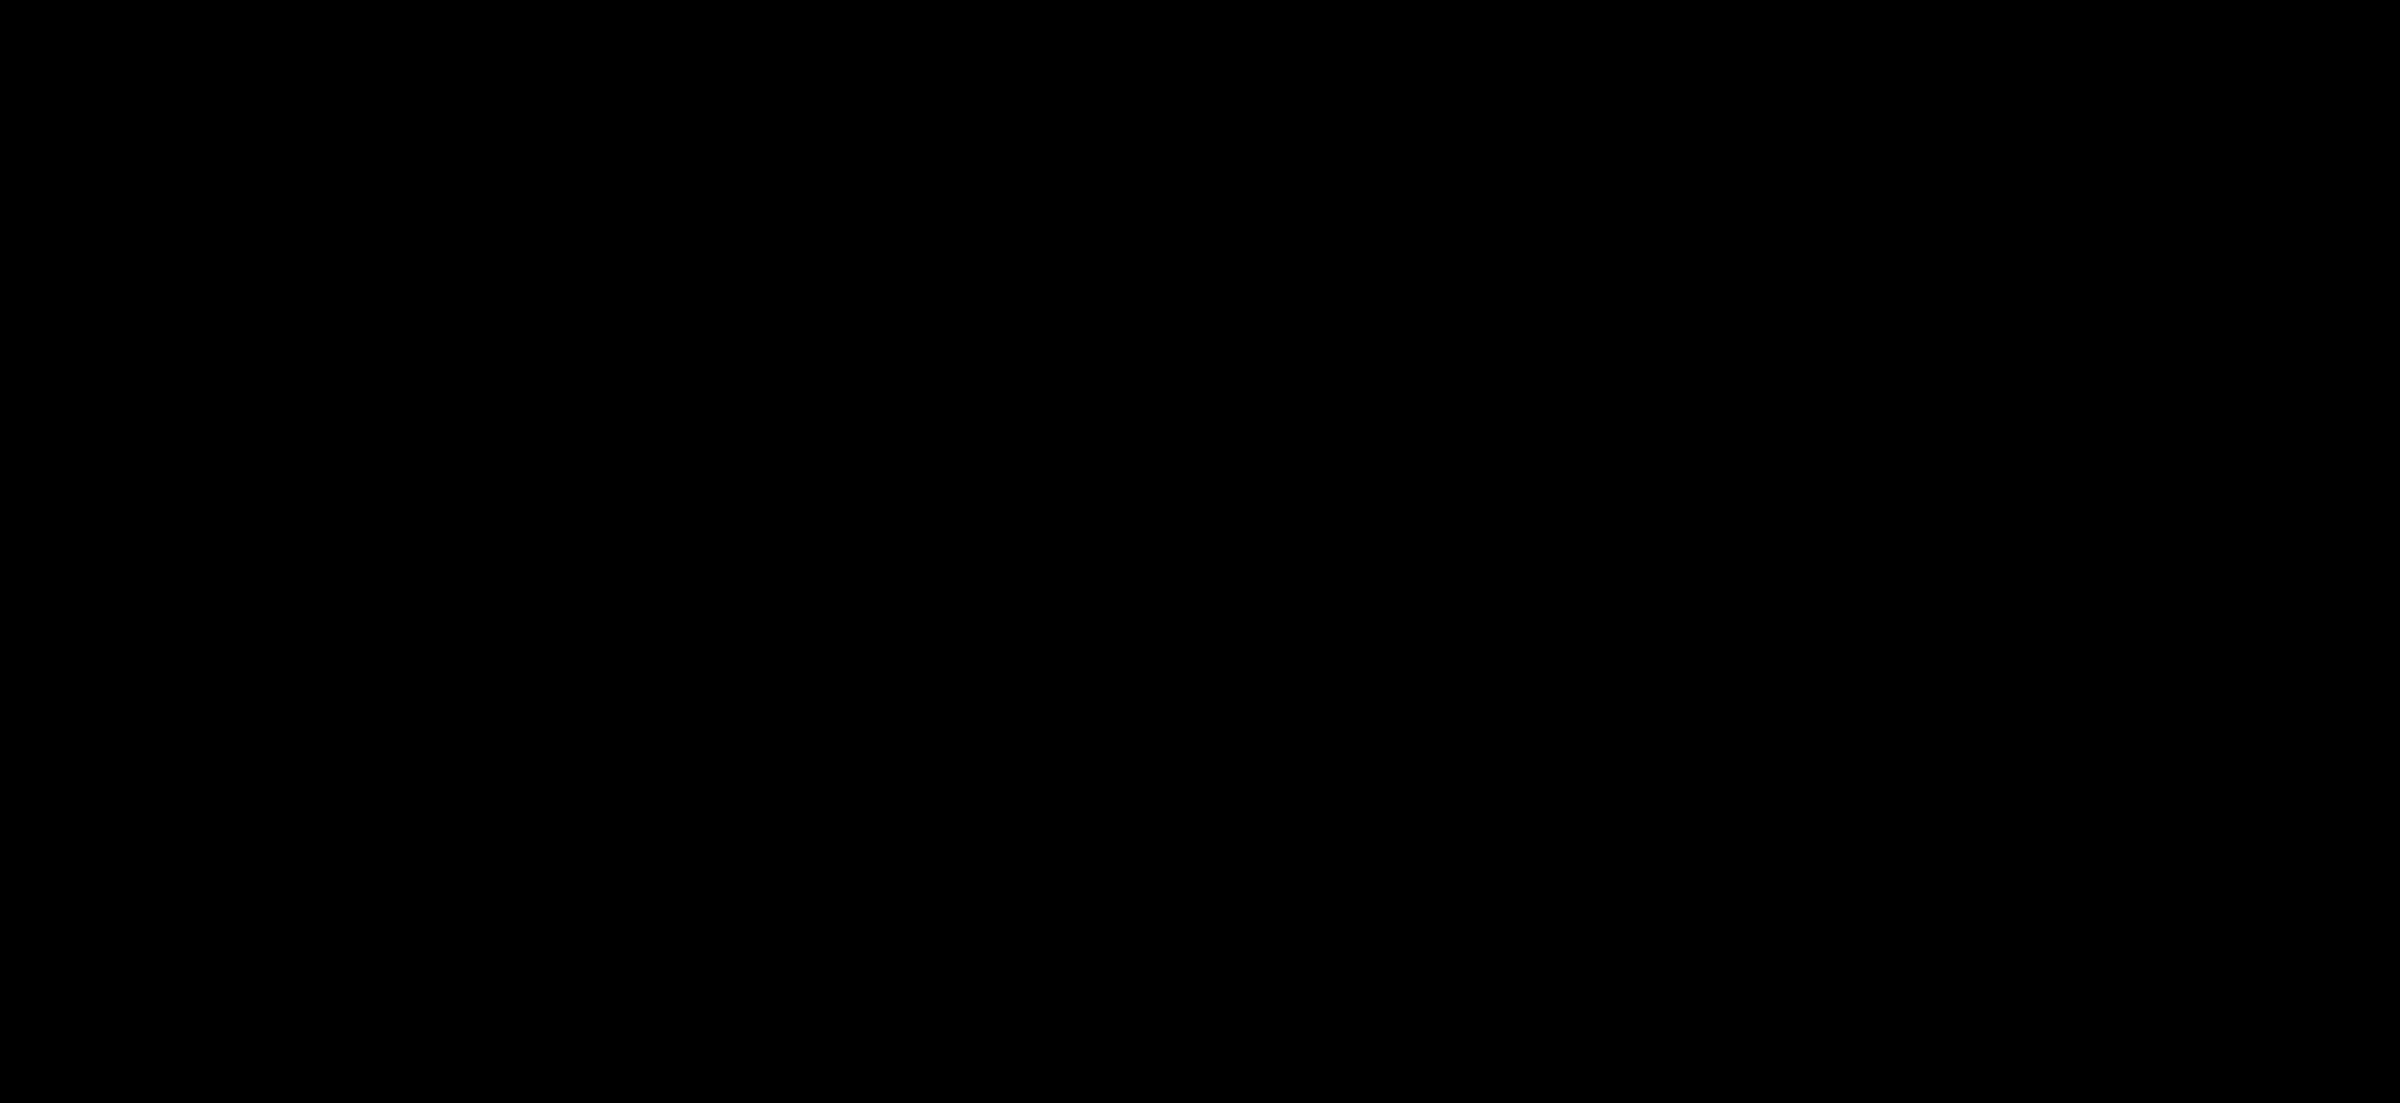 iPad Logo PNG Transparent & SVG Vector - Freebie Supply - Apple iPad Logo